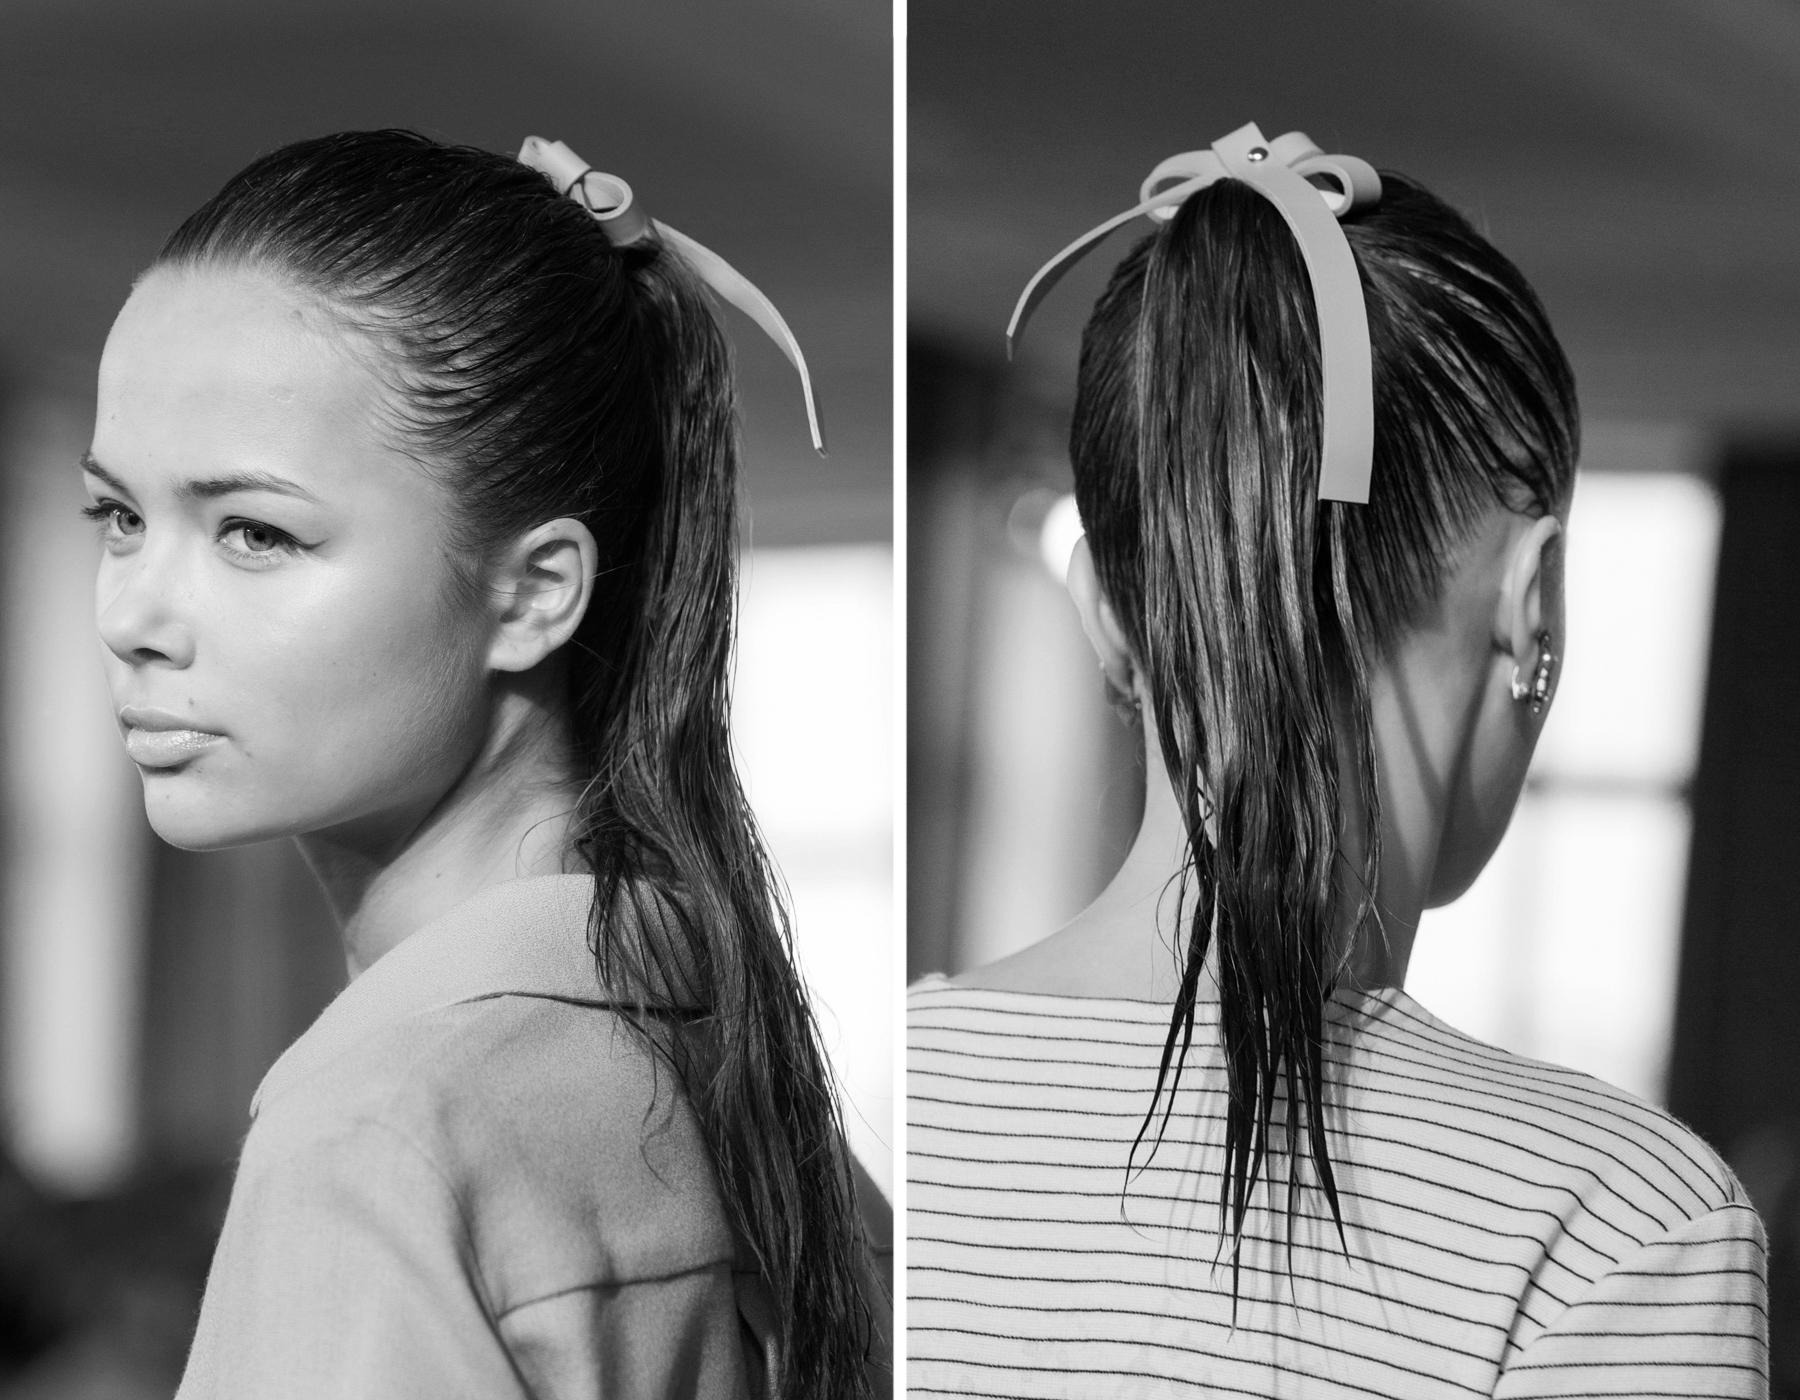 marina hoermanseder hair styling wella professional berlin fashion week mbfwb wellabewegt mode designer modedesigner modewoche mecedes benz beauty beautyblogger hairblog hair blogger cats & dogs  ricarda schernus modeblogger fashionblogger berlin 3